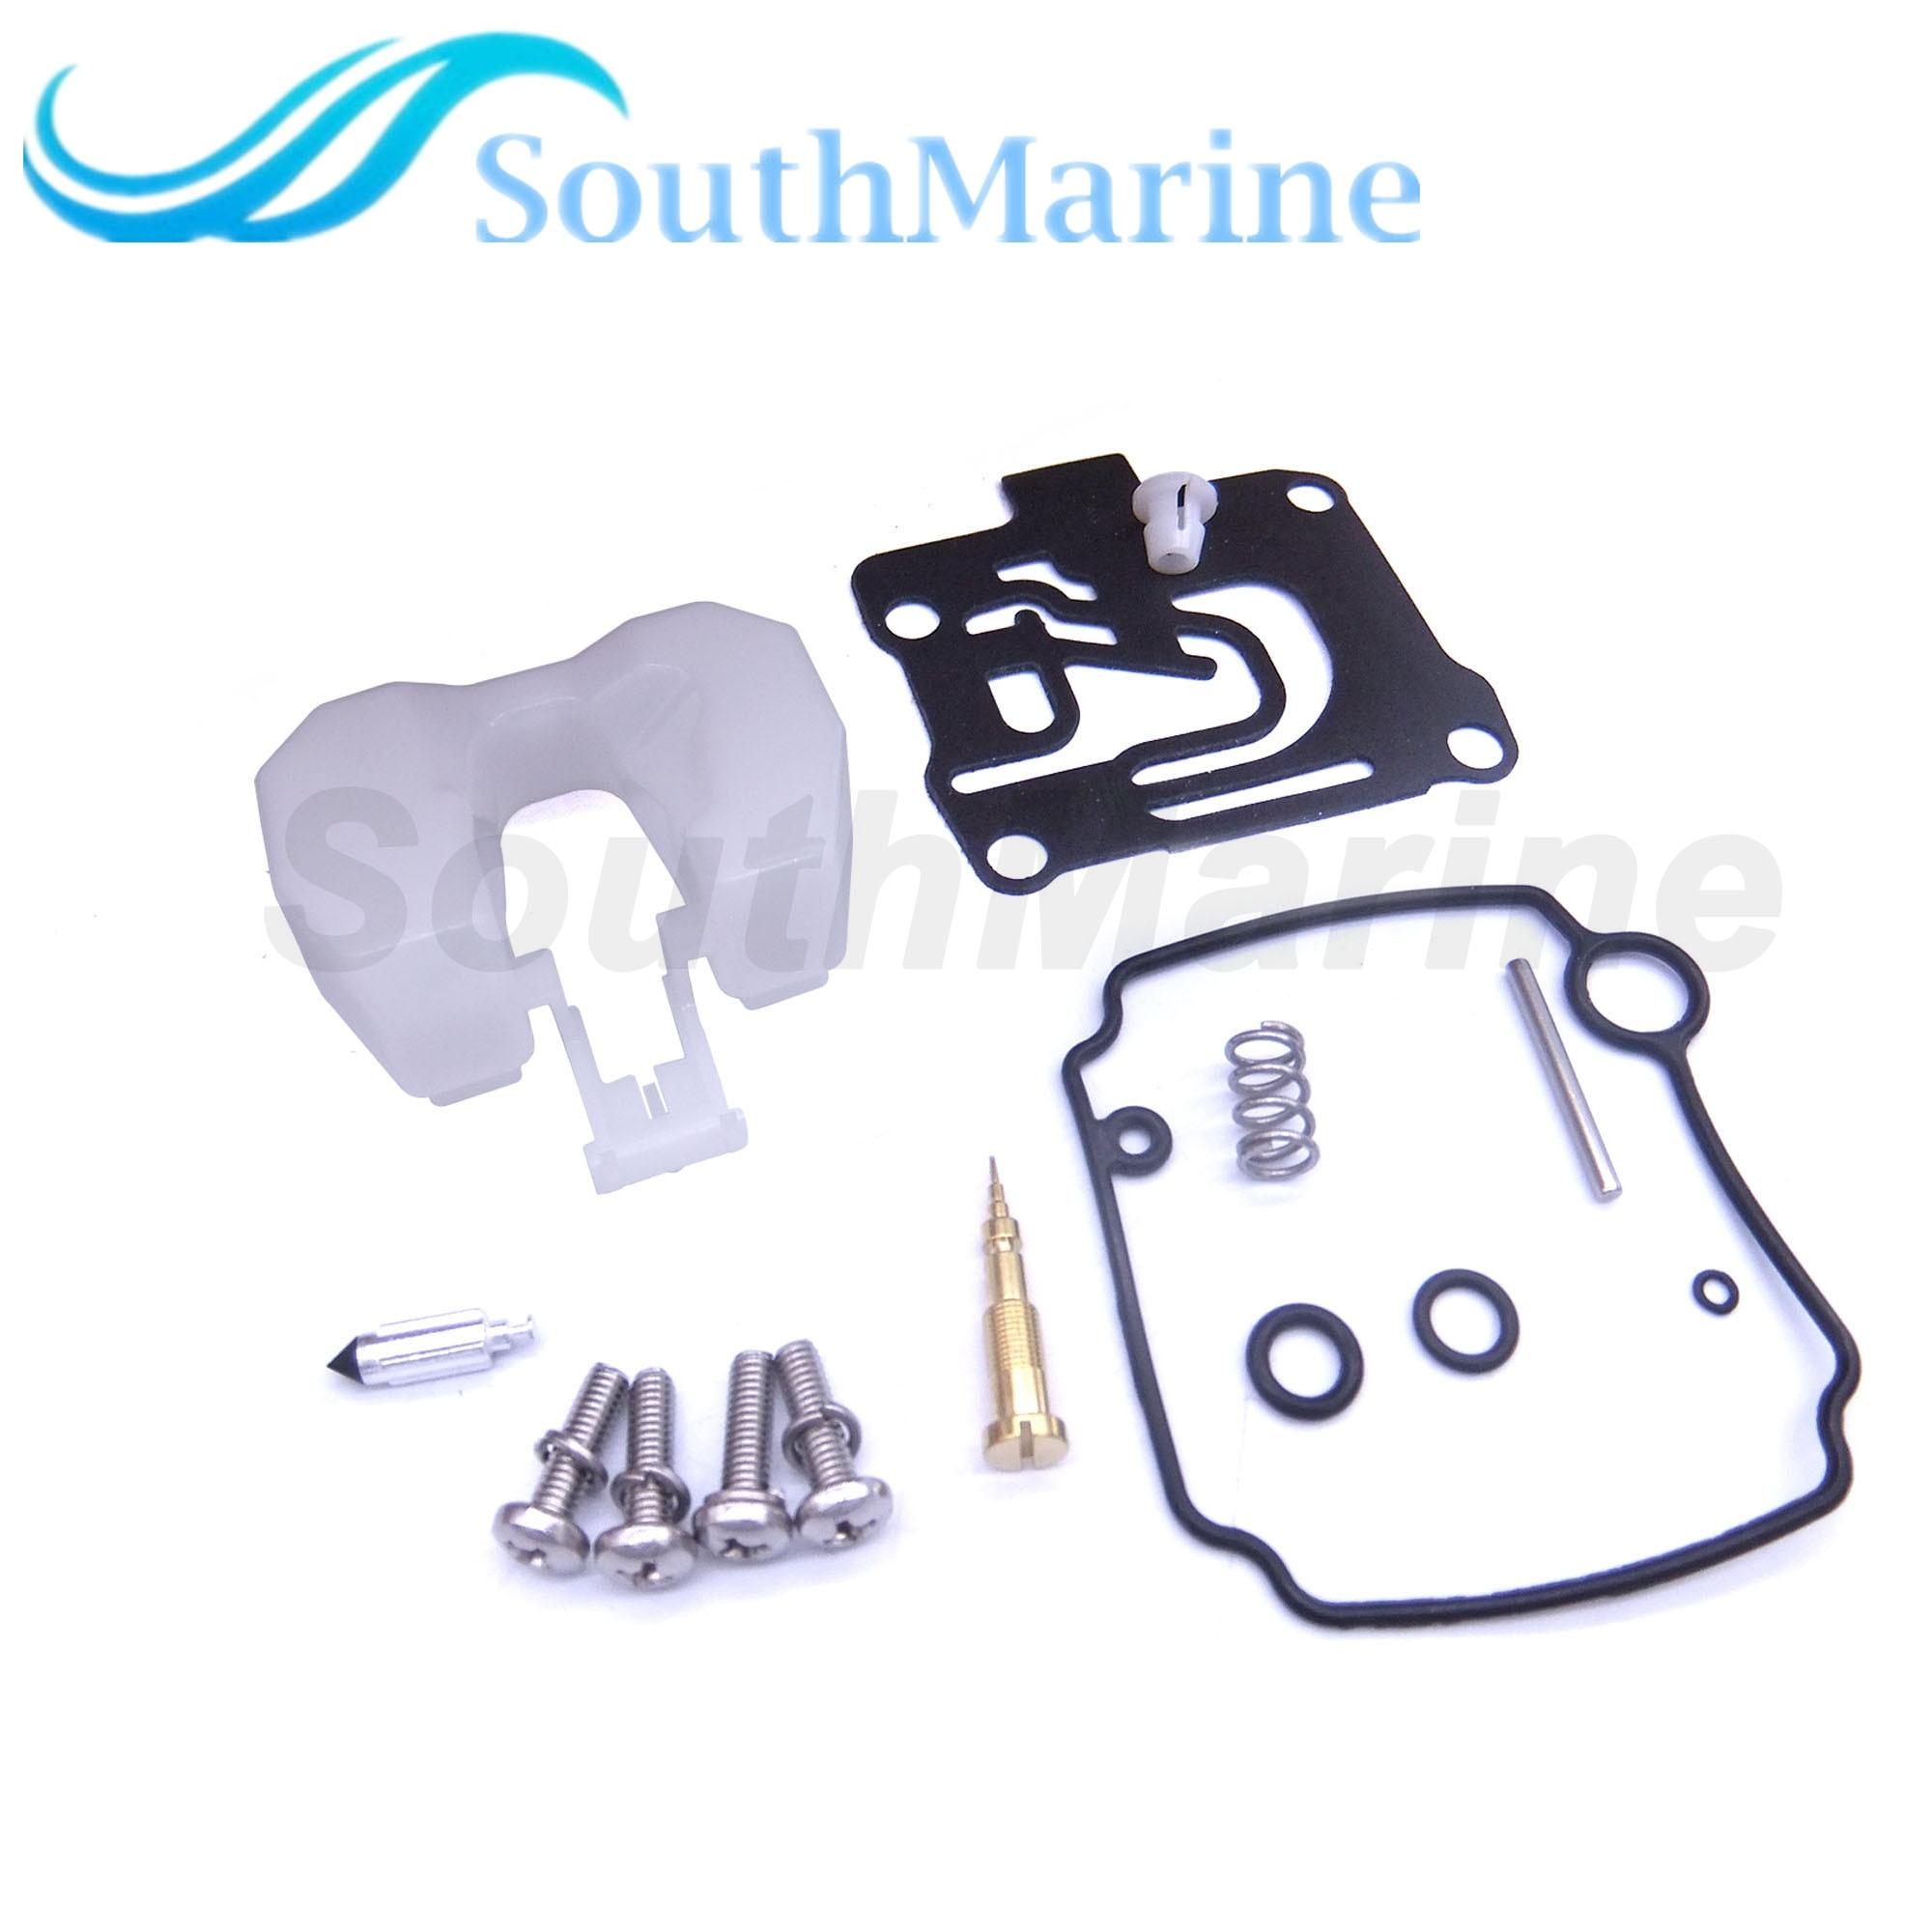 Boat Motor 62Y-W0093-10 62Y-W0093-11 Carburetor Repair Kit For Yamaha Outboard Engine 50HP T50 F50